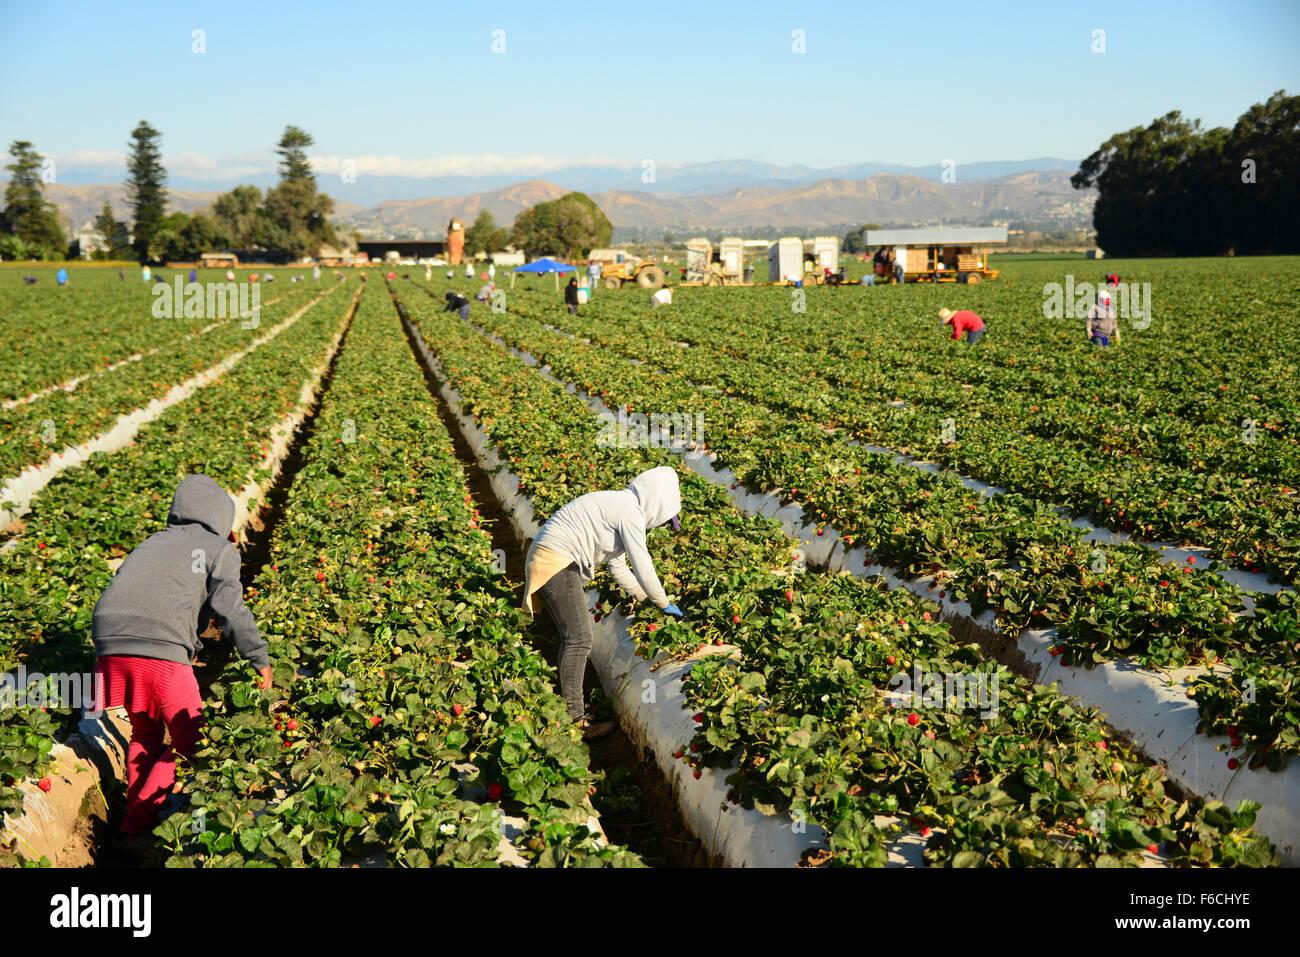 Seasonal Farm Work High Resolution Stock Photography And Images Alamy